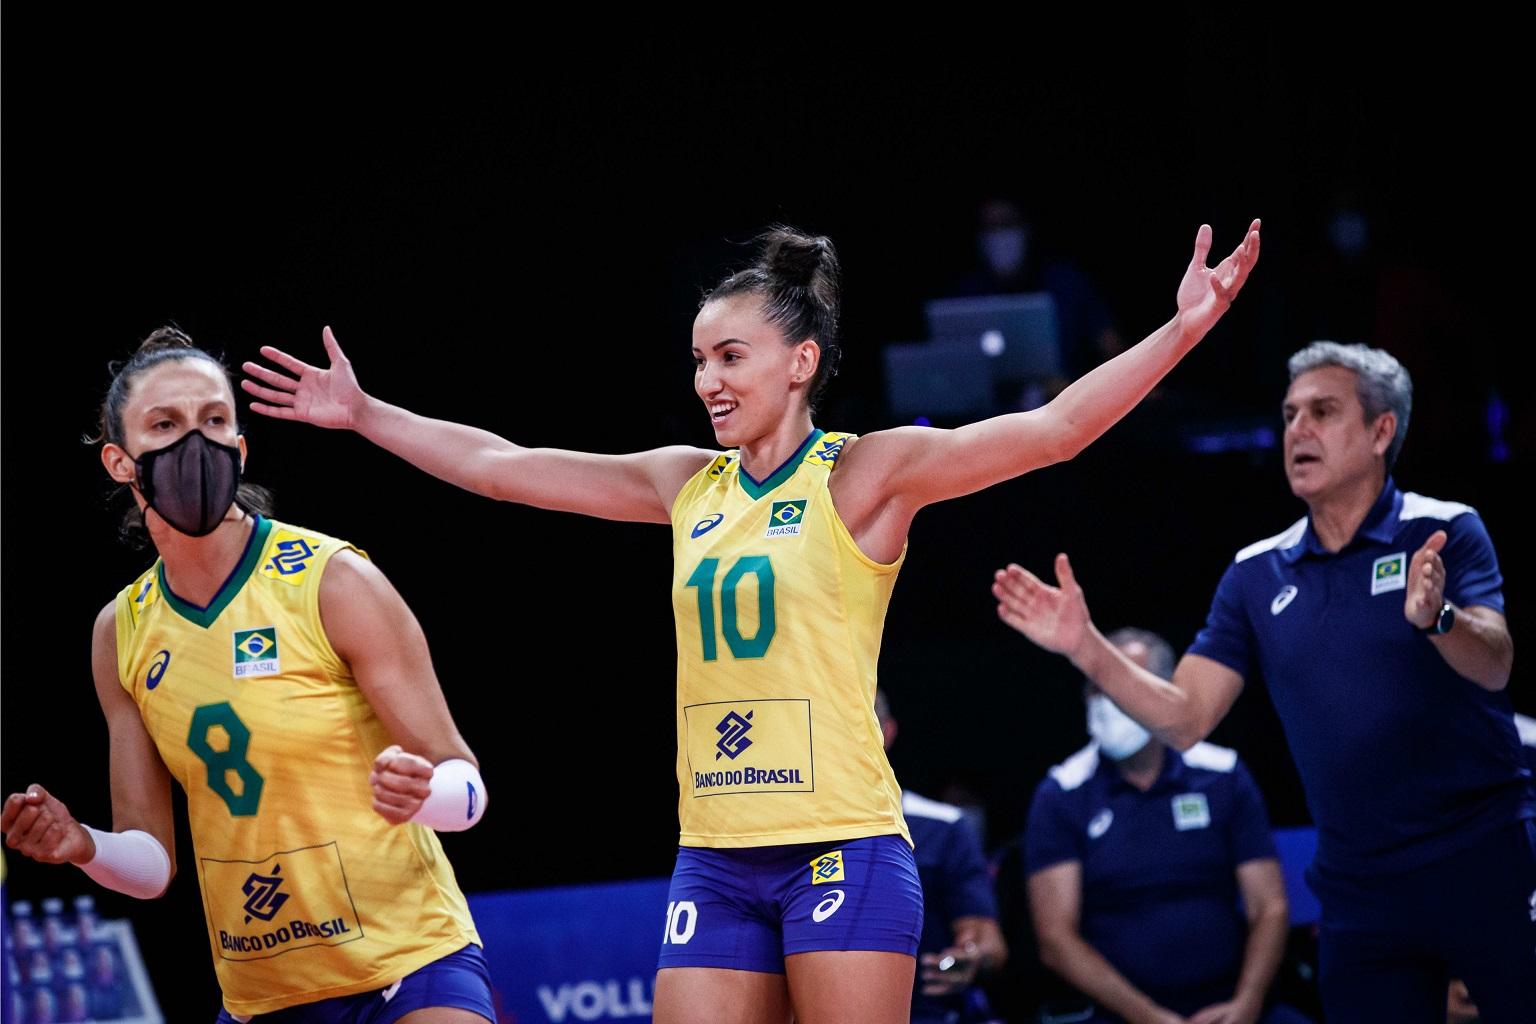 thumbnail do Álbum Liga das Nações 2021 - Semifinal 1: Brasil 3 x 1 Japão